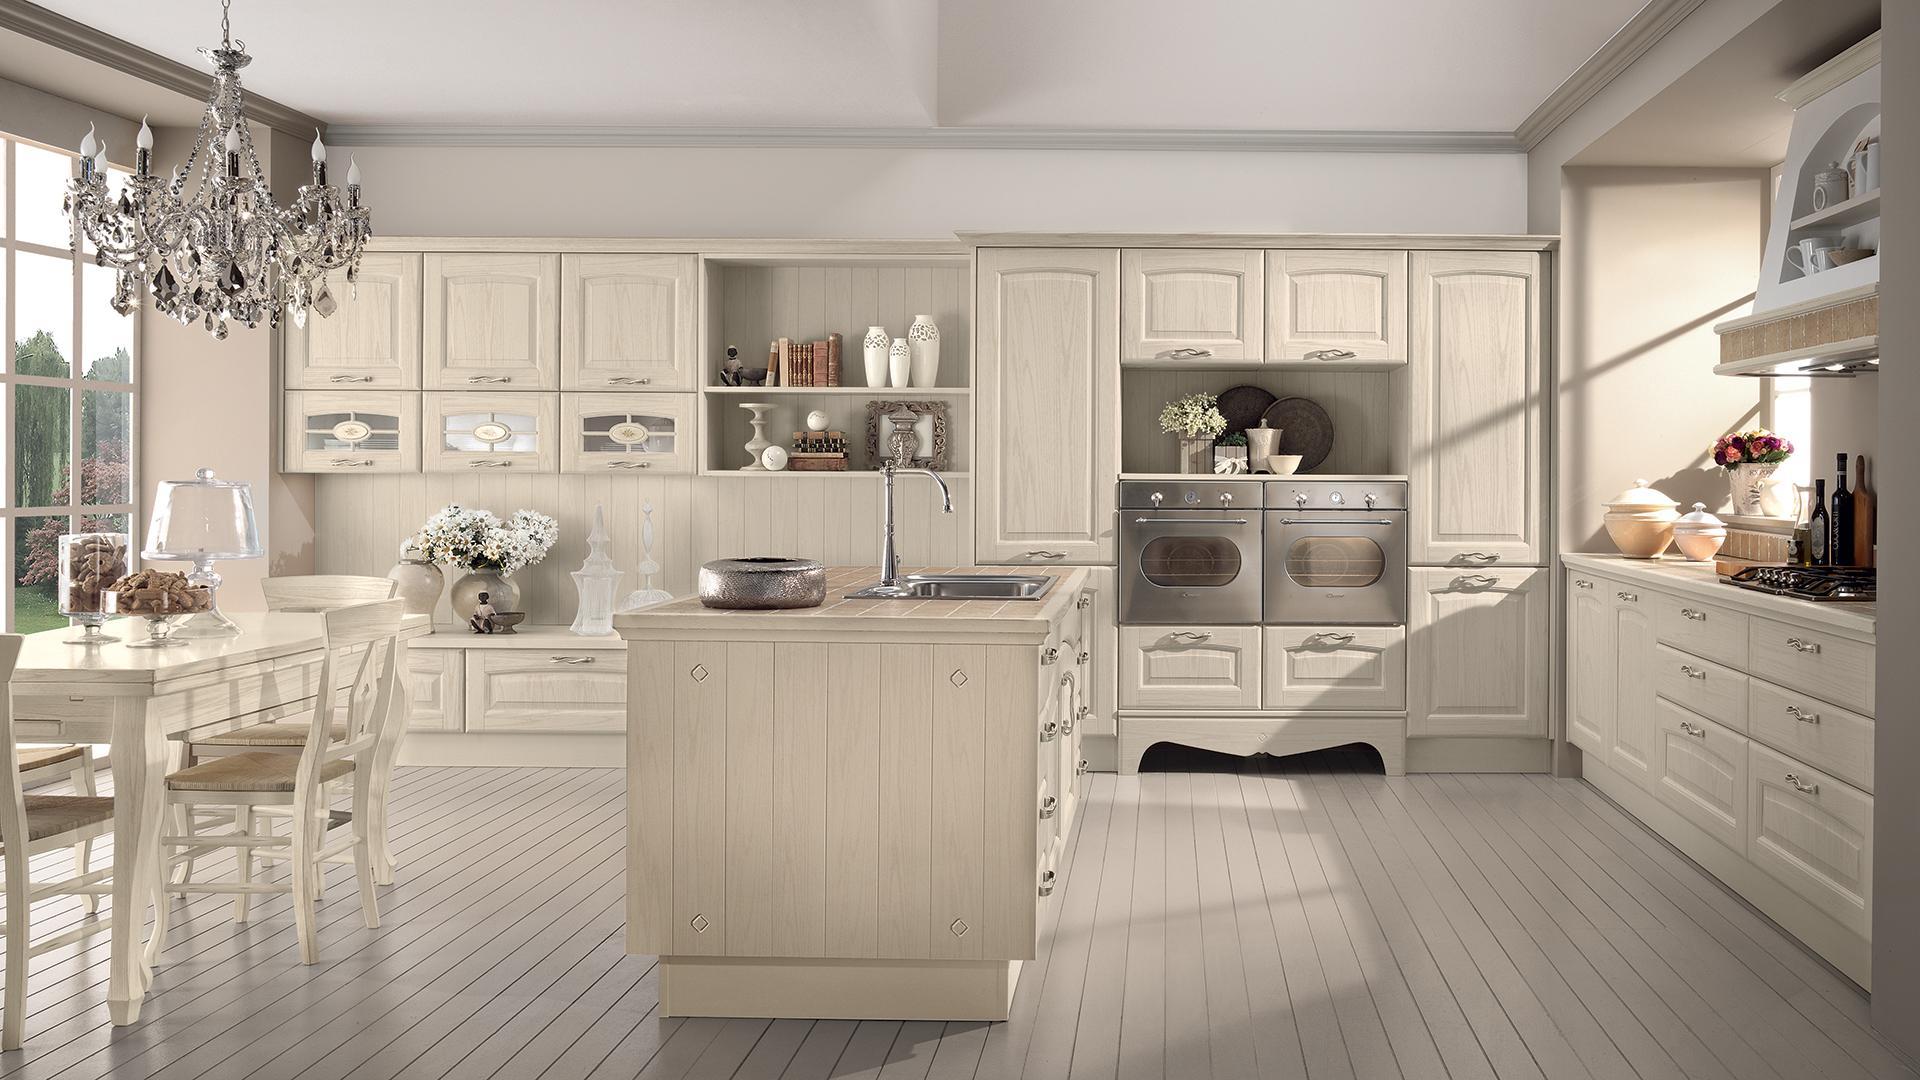 Cucina rustica le soluzioni classiche di lube store per - Colori pareti cucina classica ...